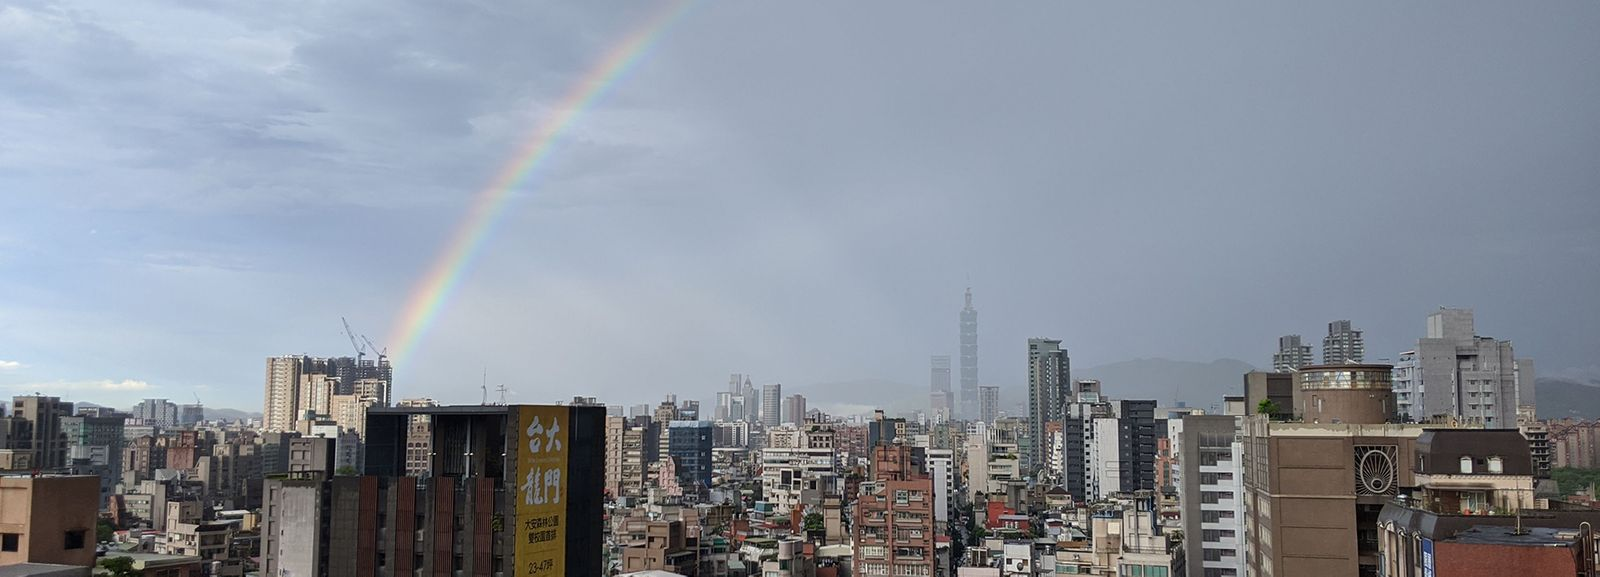 Photo of a rainbow over Taipei 101.